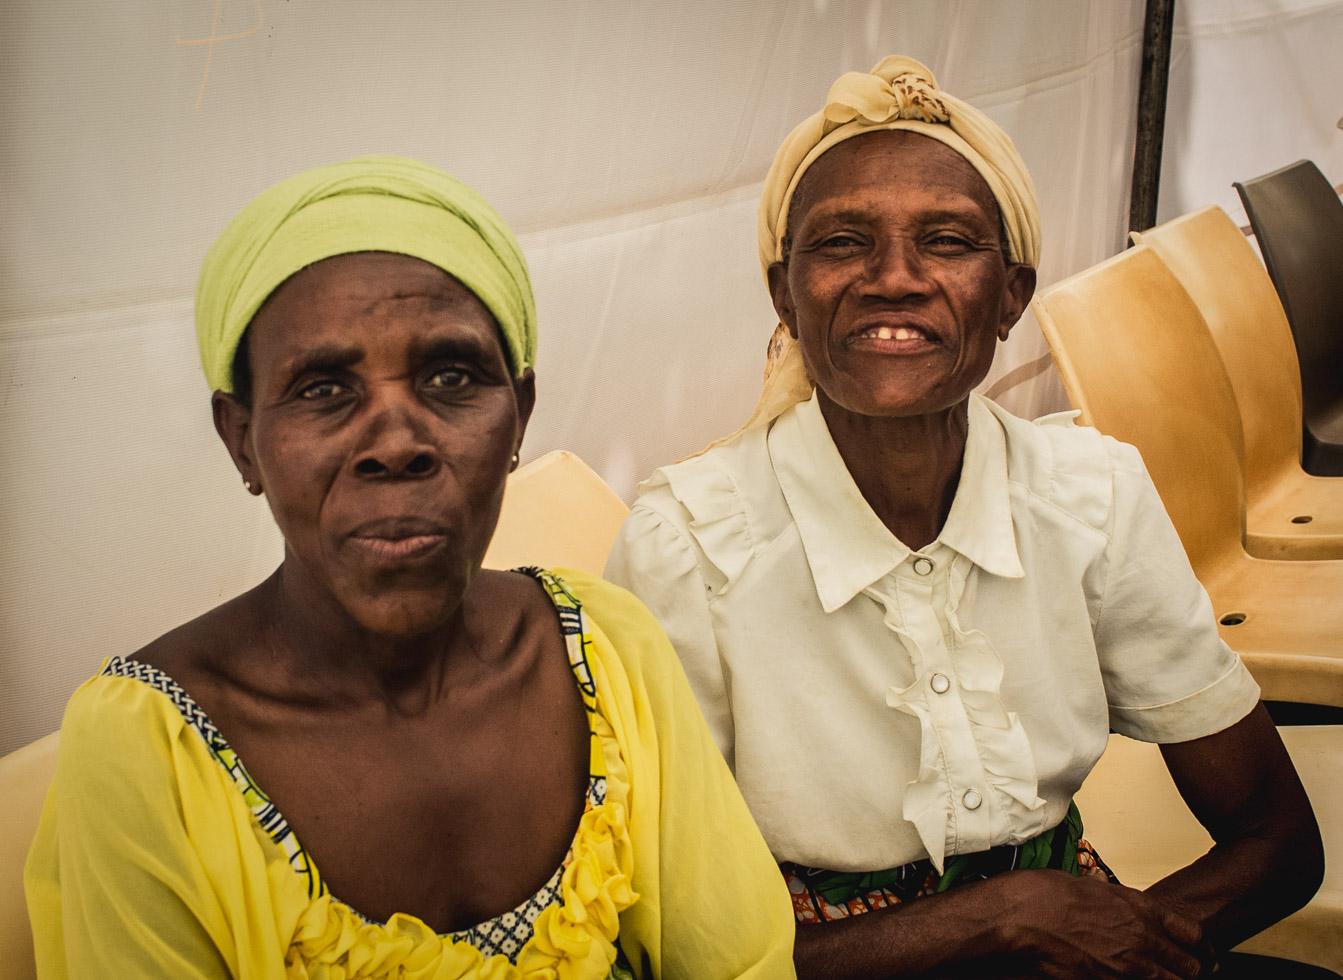 Humanitarian image of women, advocating hope